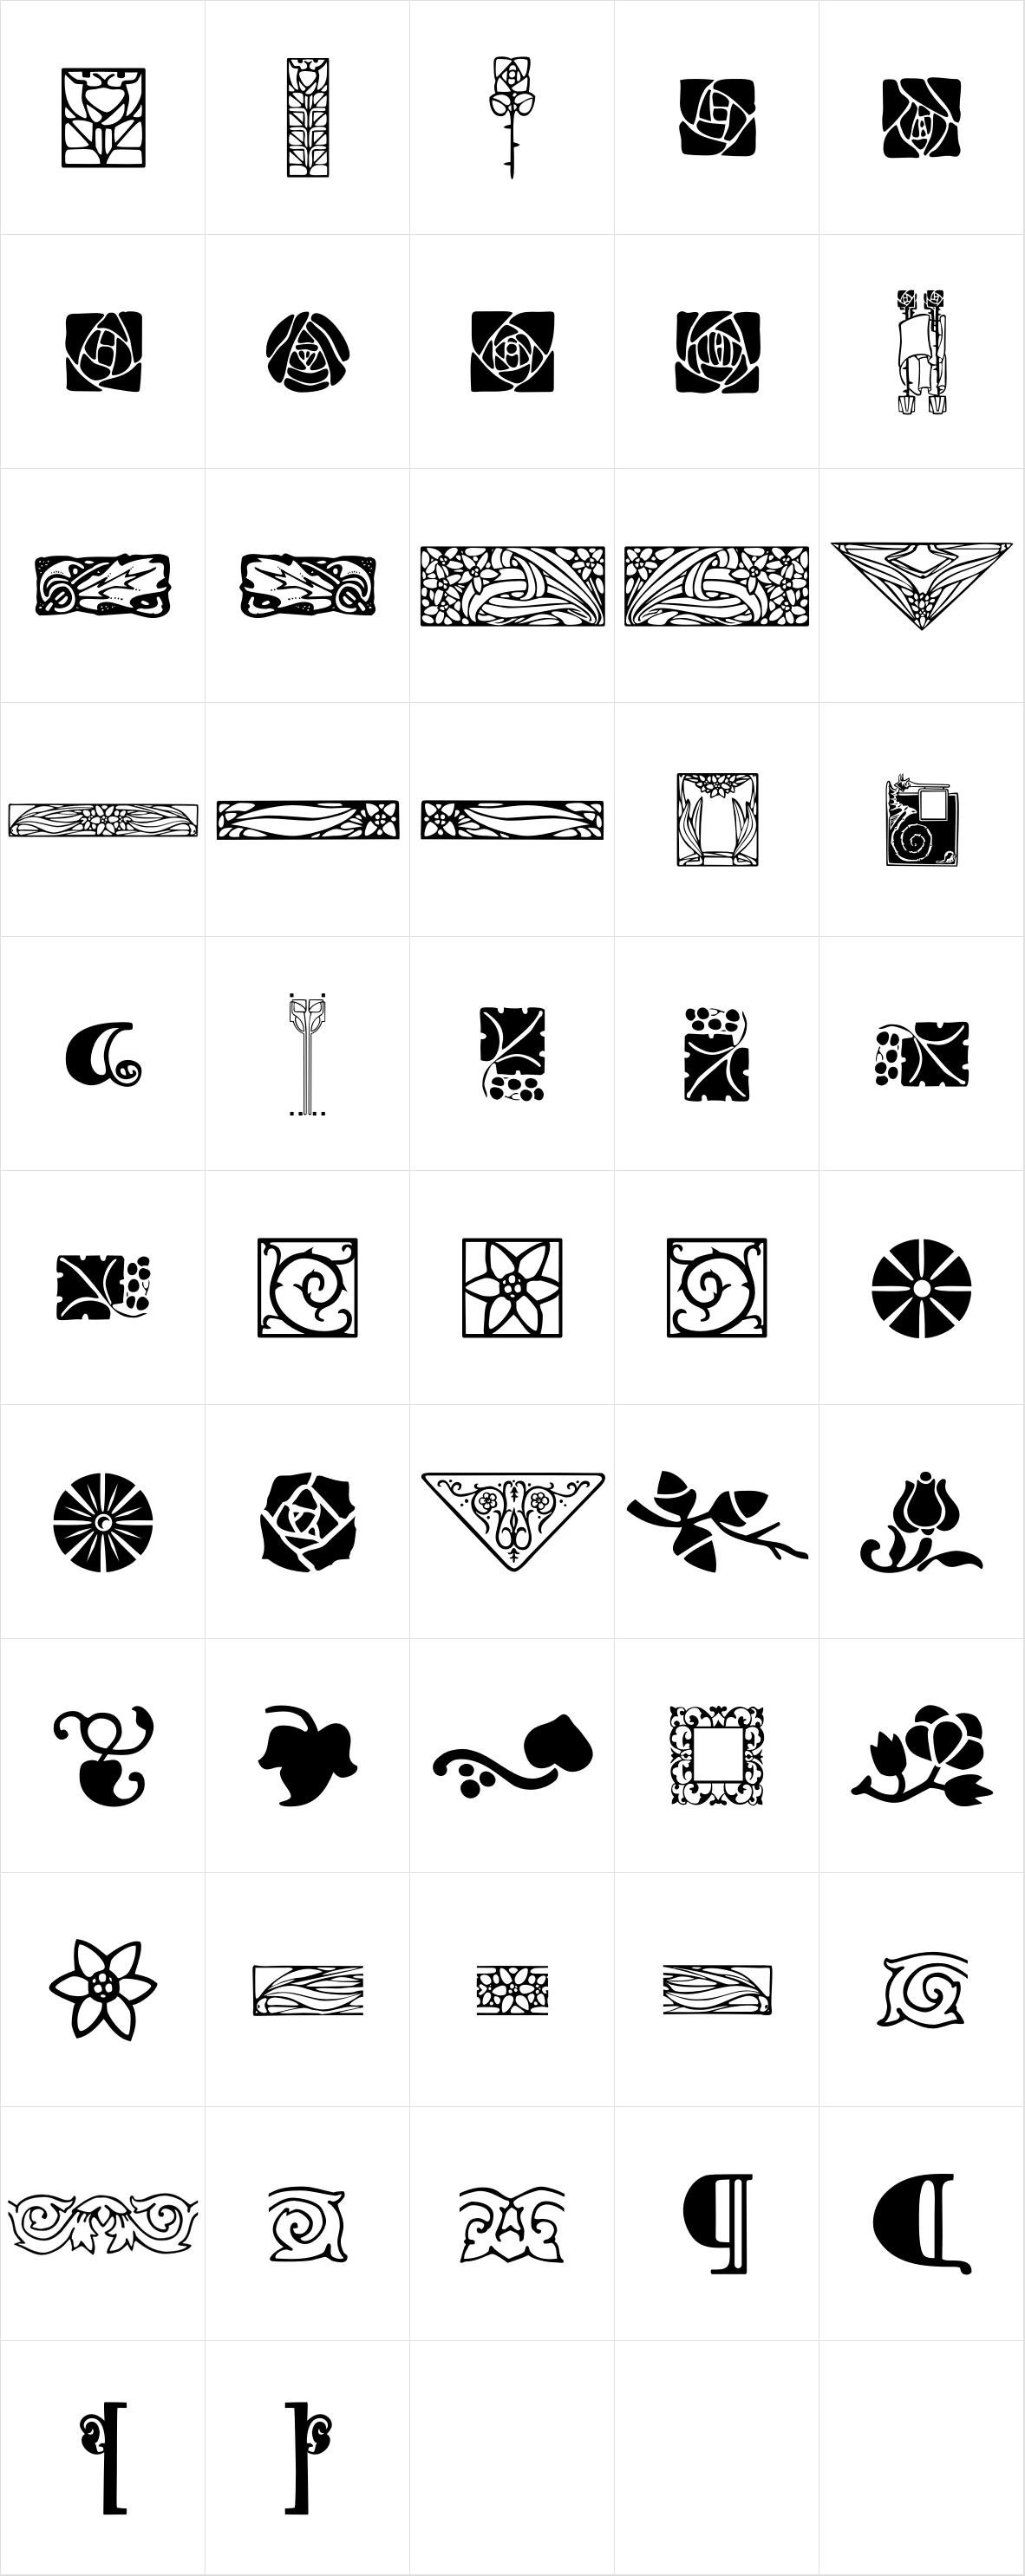 P22 Arts And Crafts Ornaments